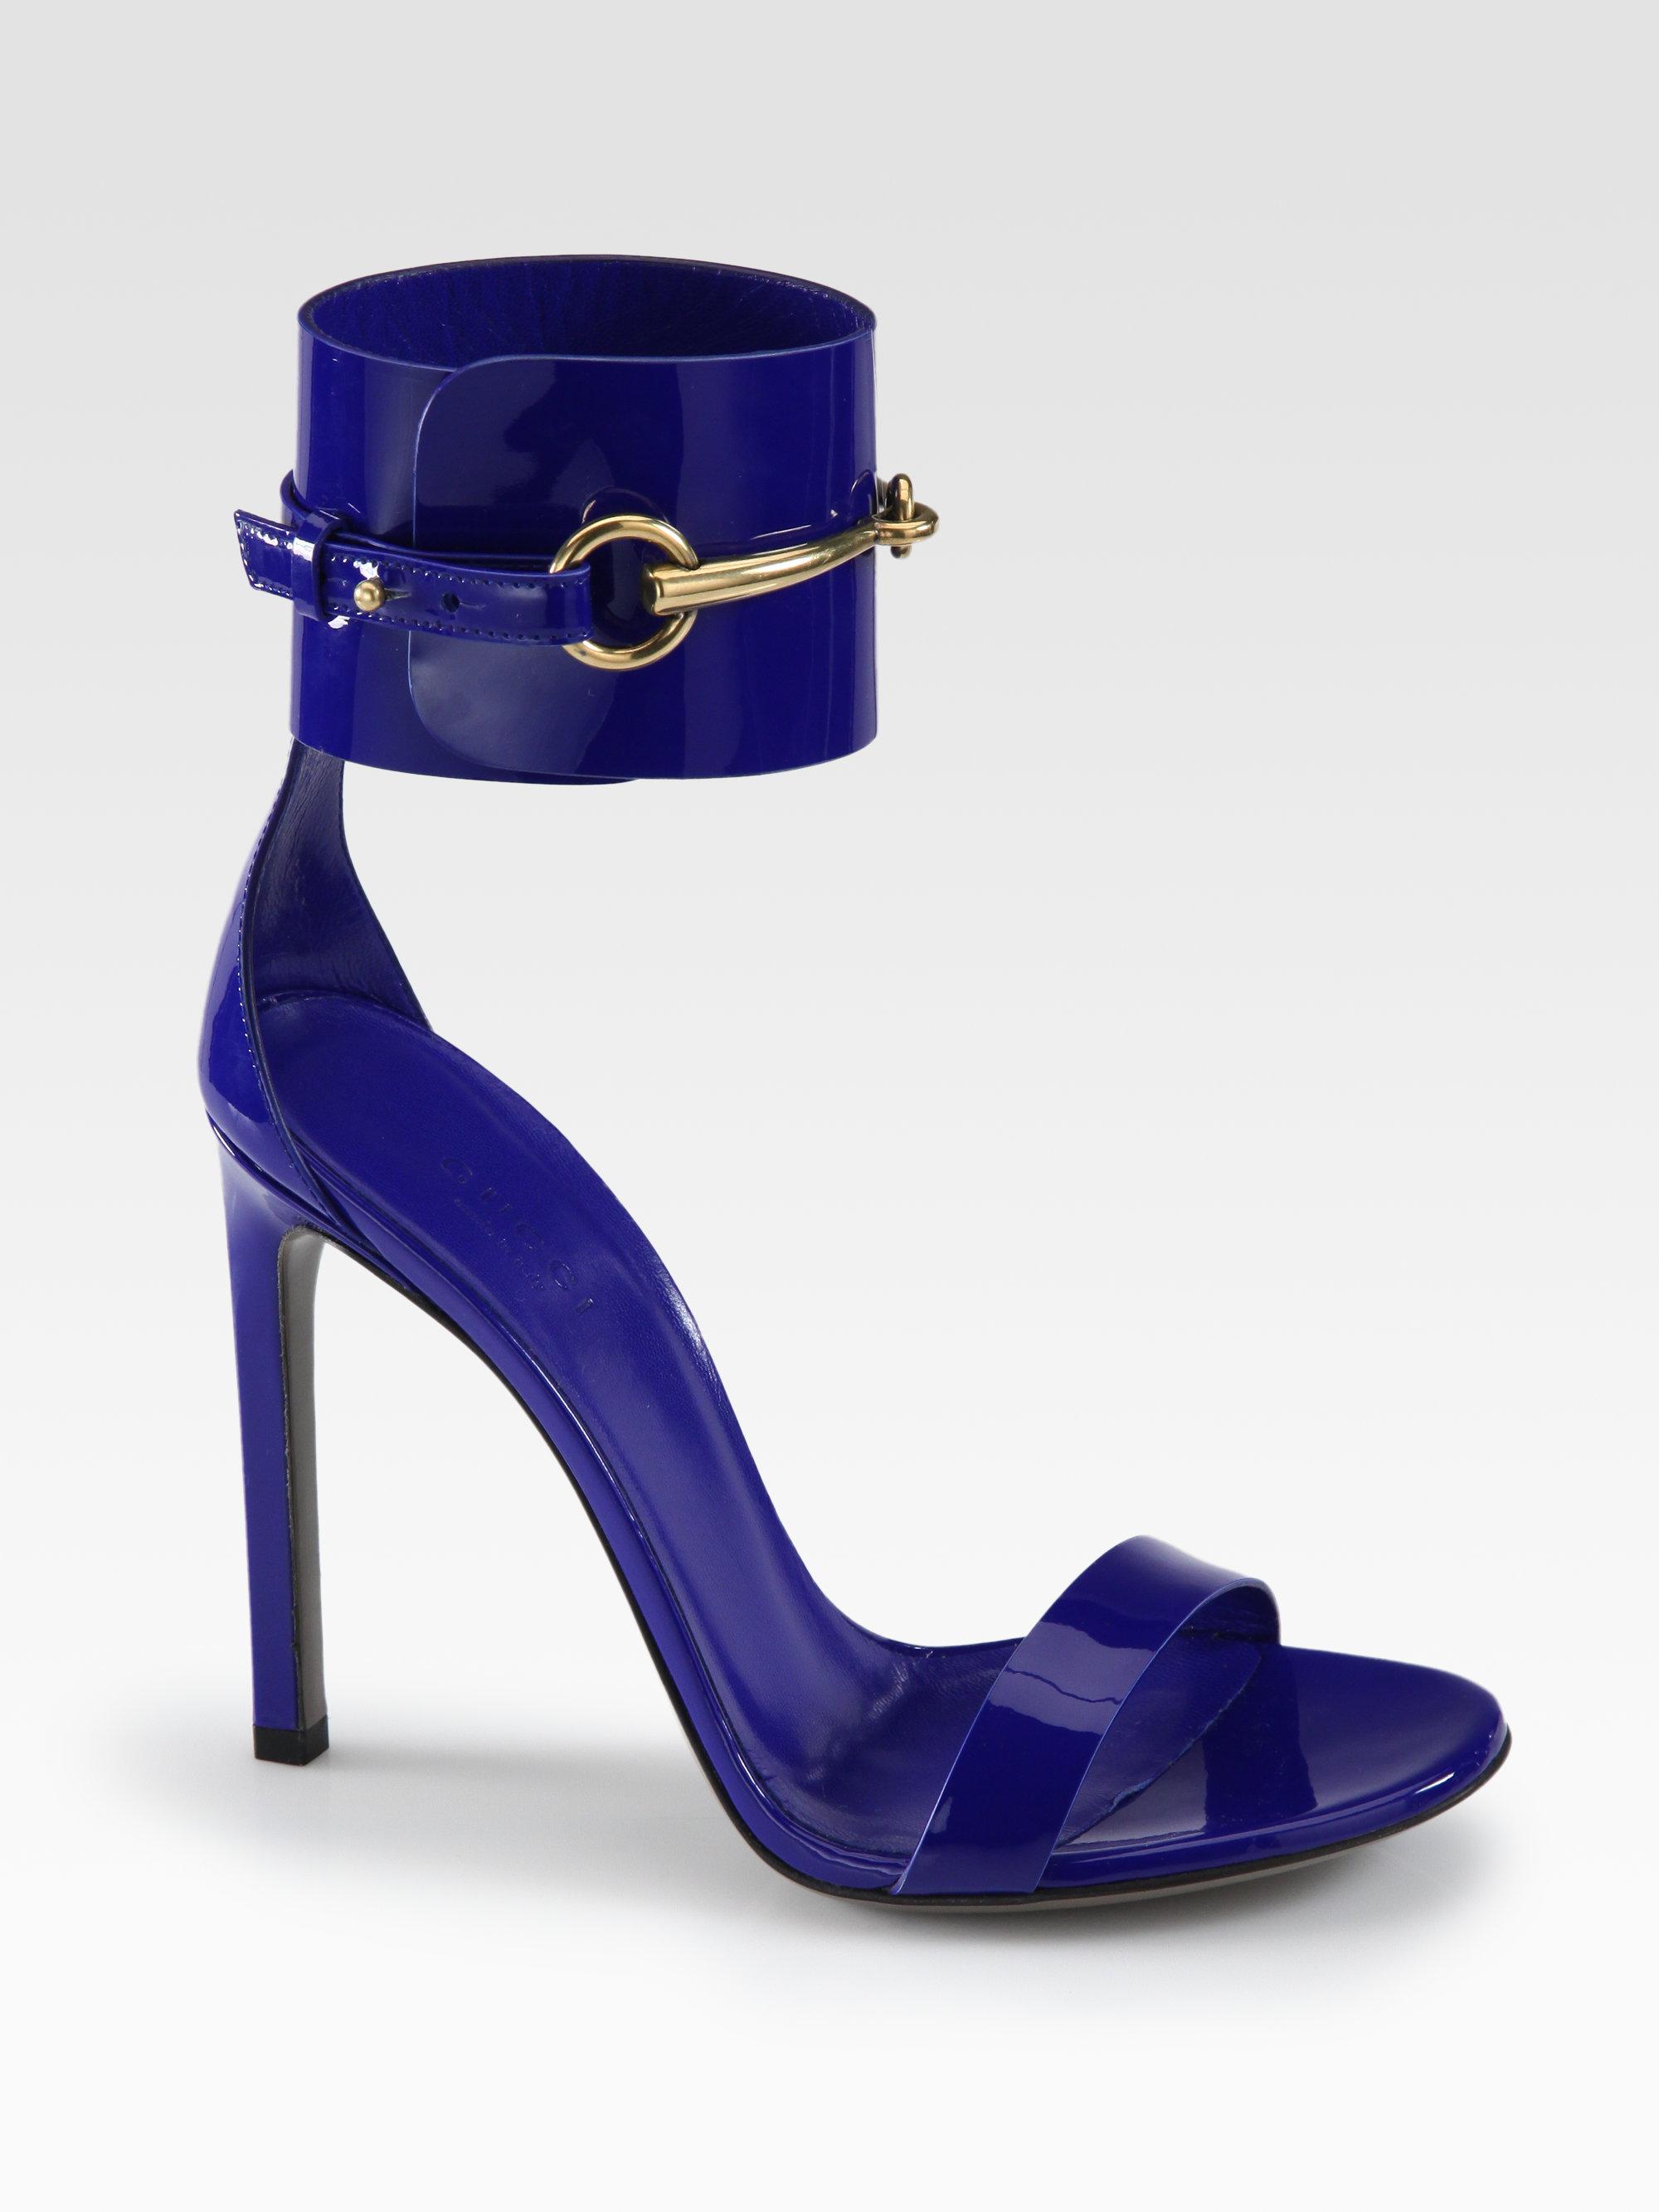 c4d02d2f187 Lyst - Gucci Ursula Patent Leather Horsebit Ankle-Strap Sandals in Black